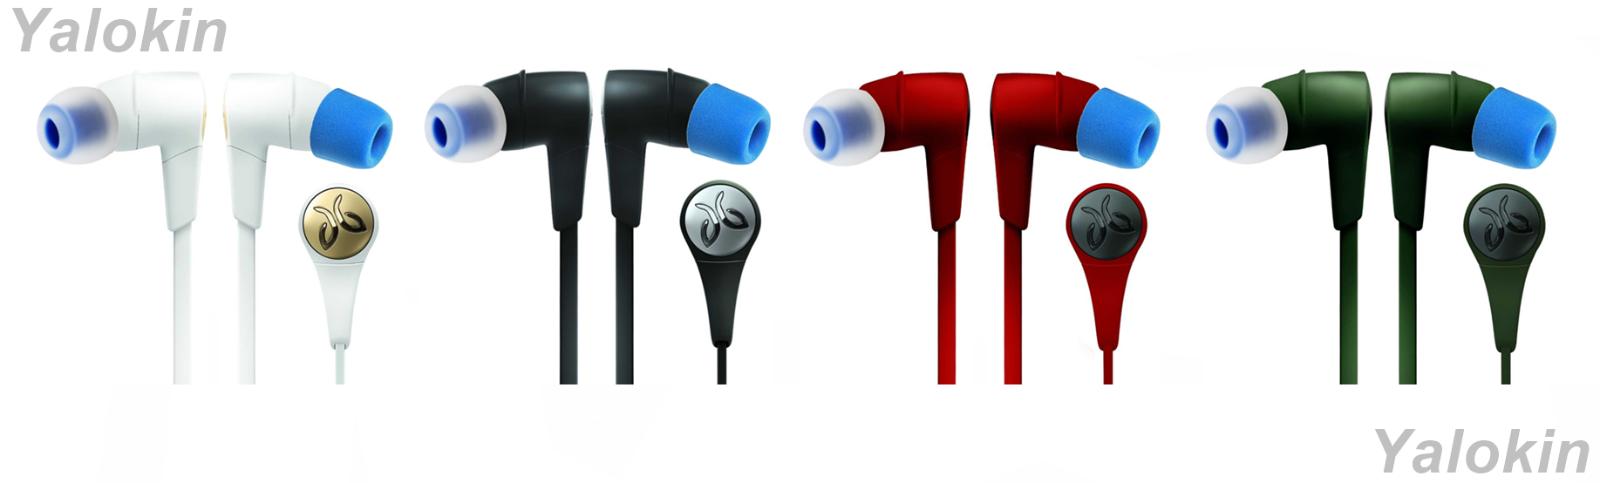 Replacement Ear-tips Set NEW 8pcs Large For Jaybird X3 Wireless-Earphones BK